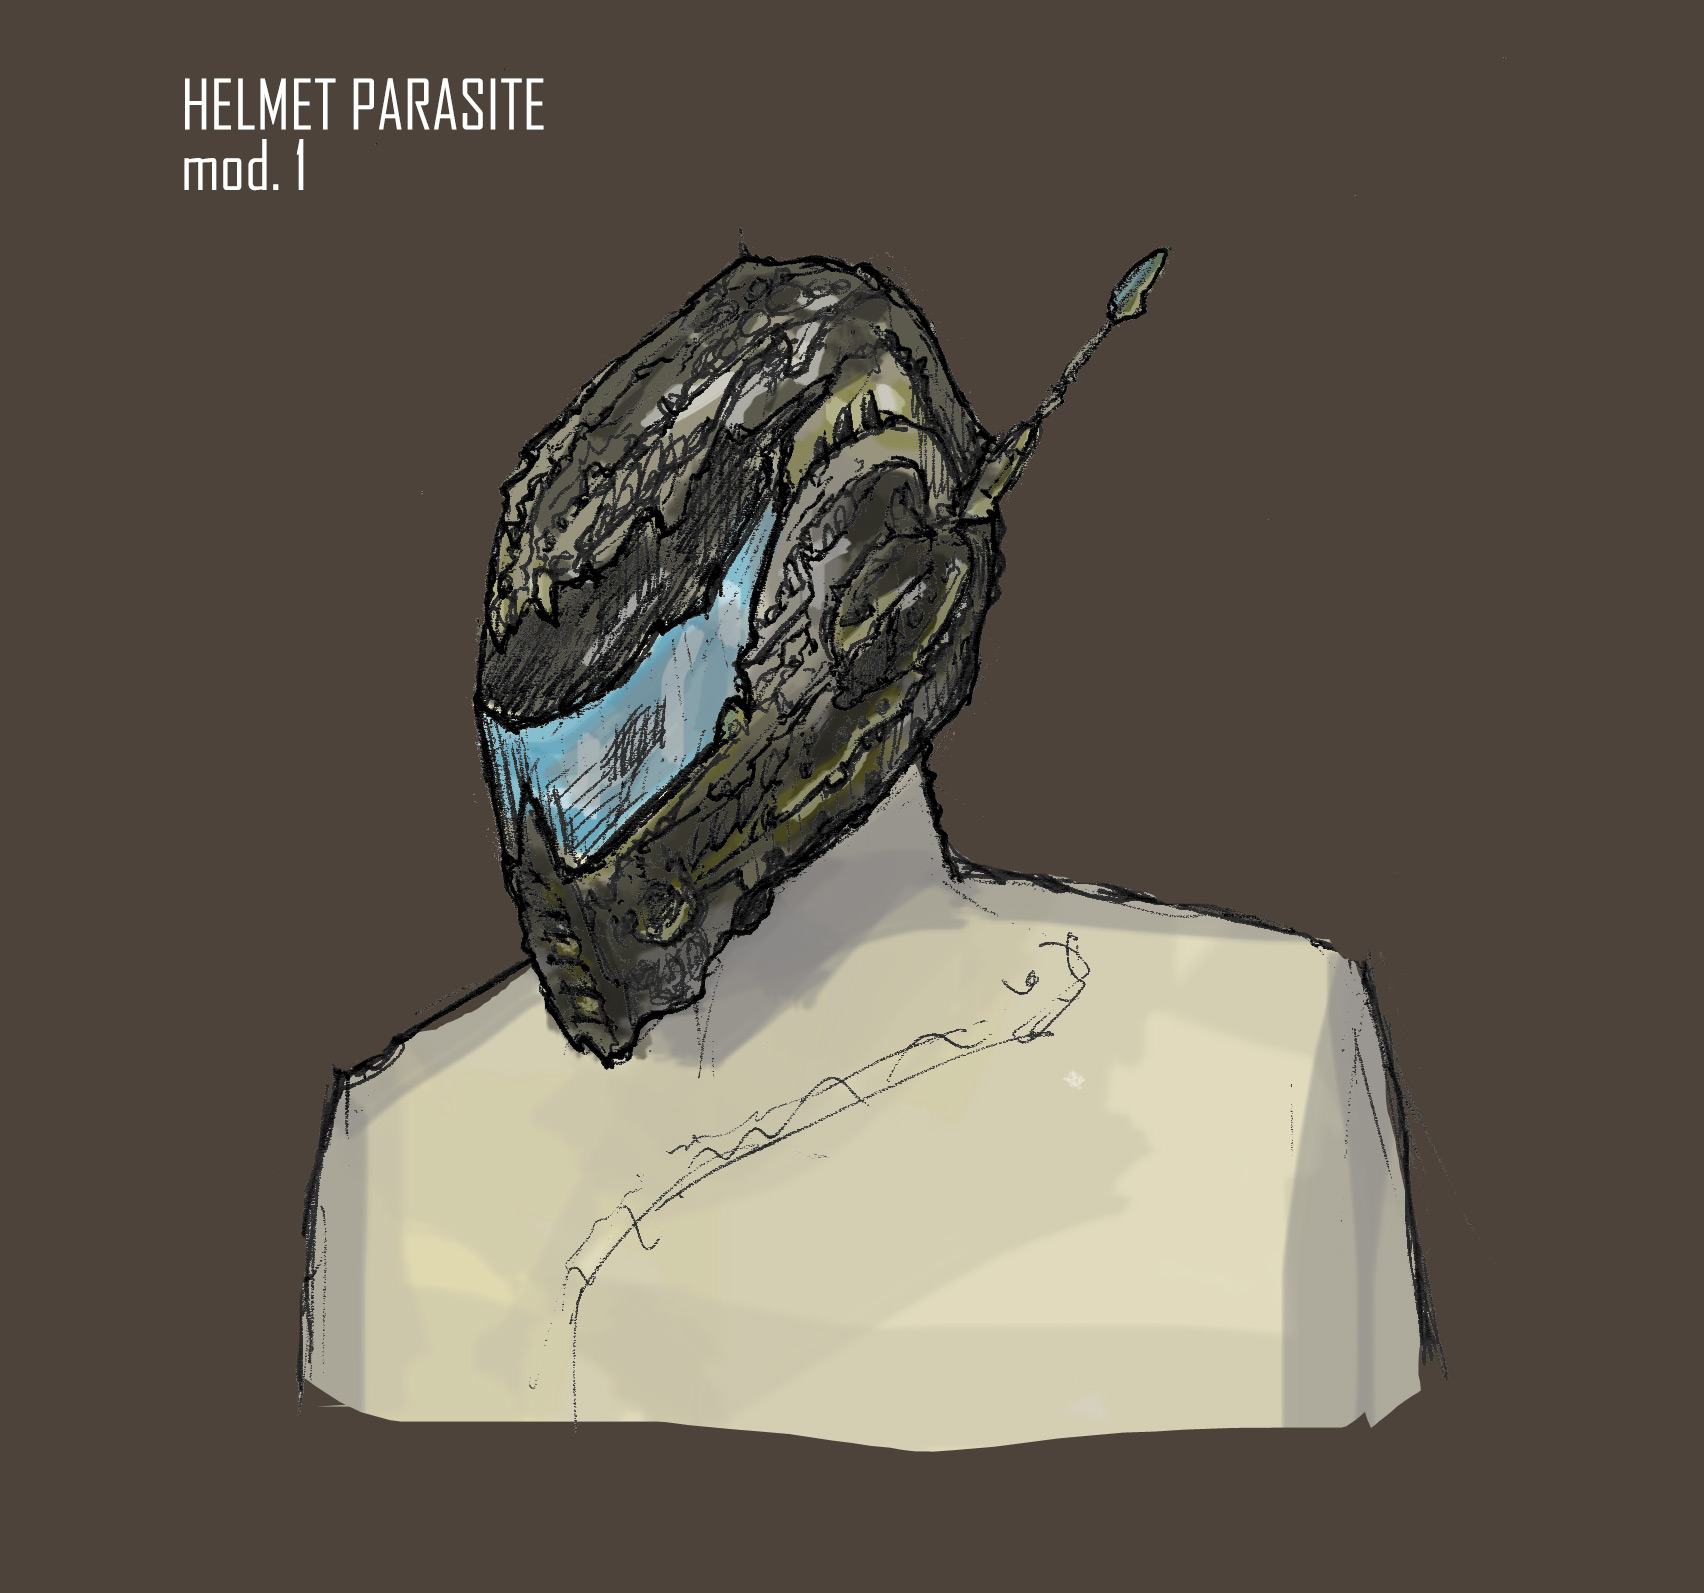 Helmet parasite